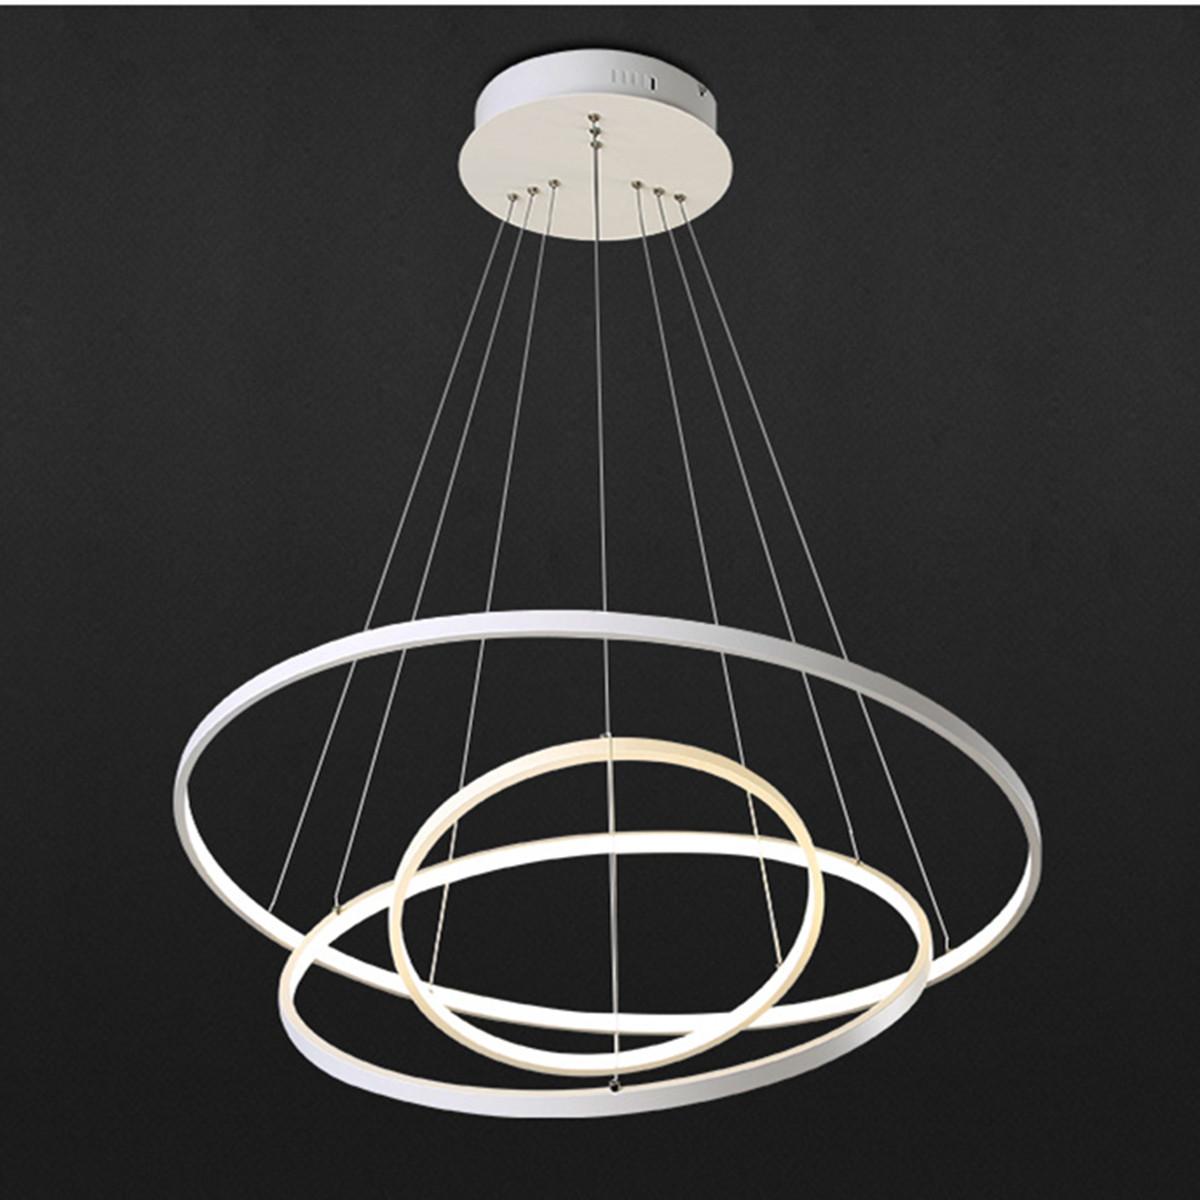 Acrylic Led Ring Chandelier Pendant Lamp Ceiling Light: Modern Circular Ring Pendant Light Acrylic Aluminum LED